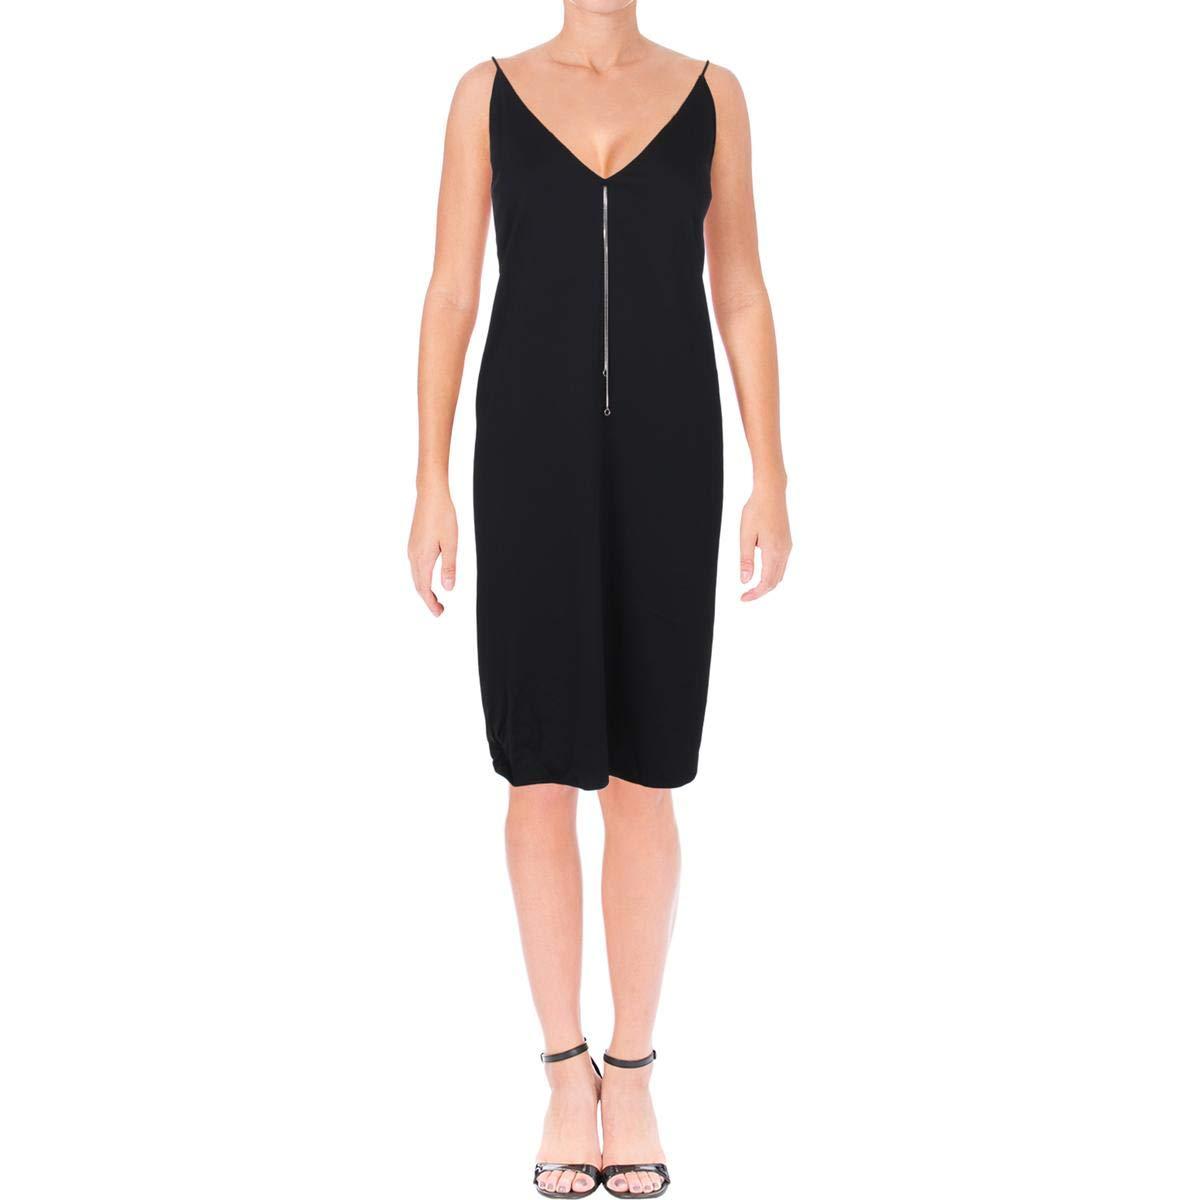 Black T by Alexander Wang Womens Chain Detail Sleeveless Cocktail Dress